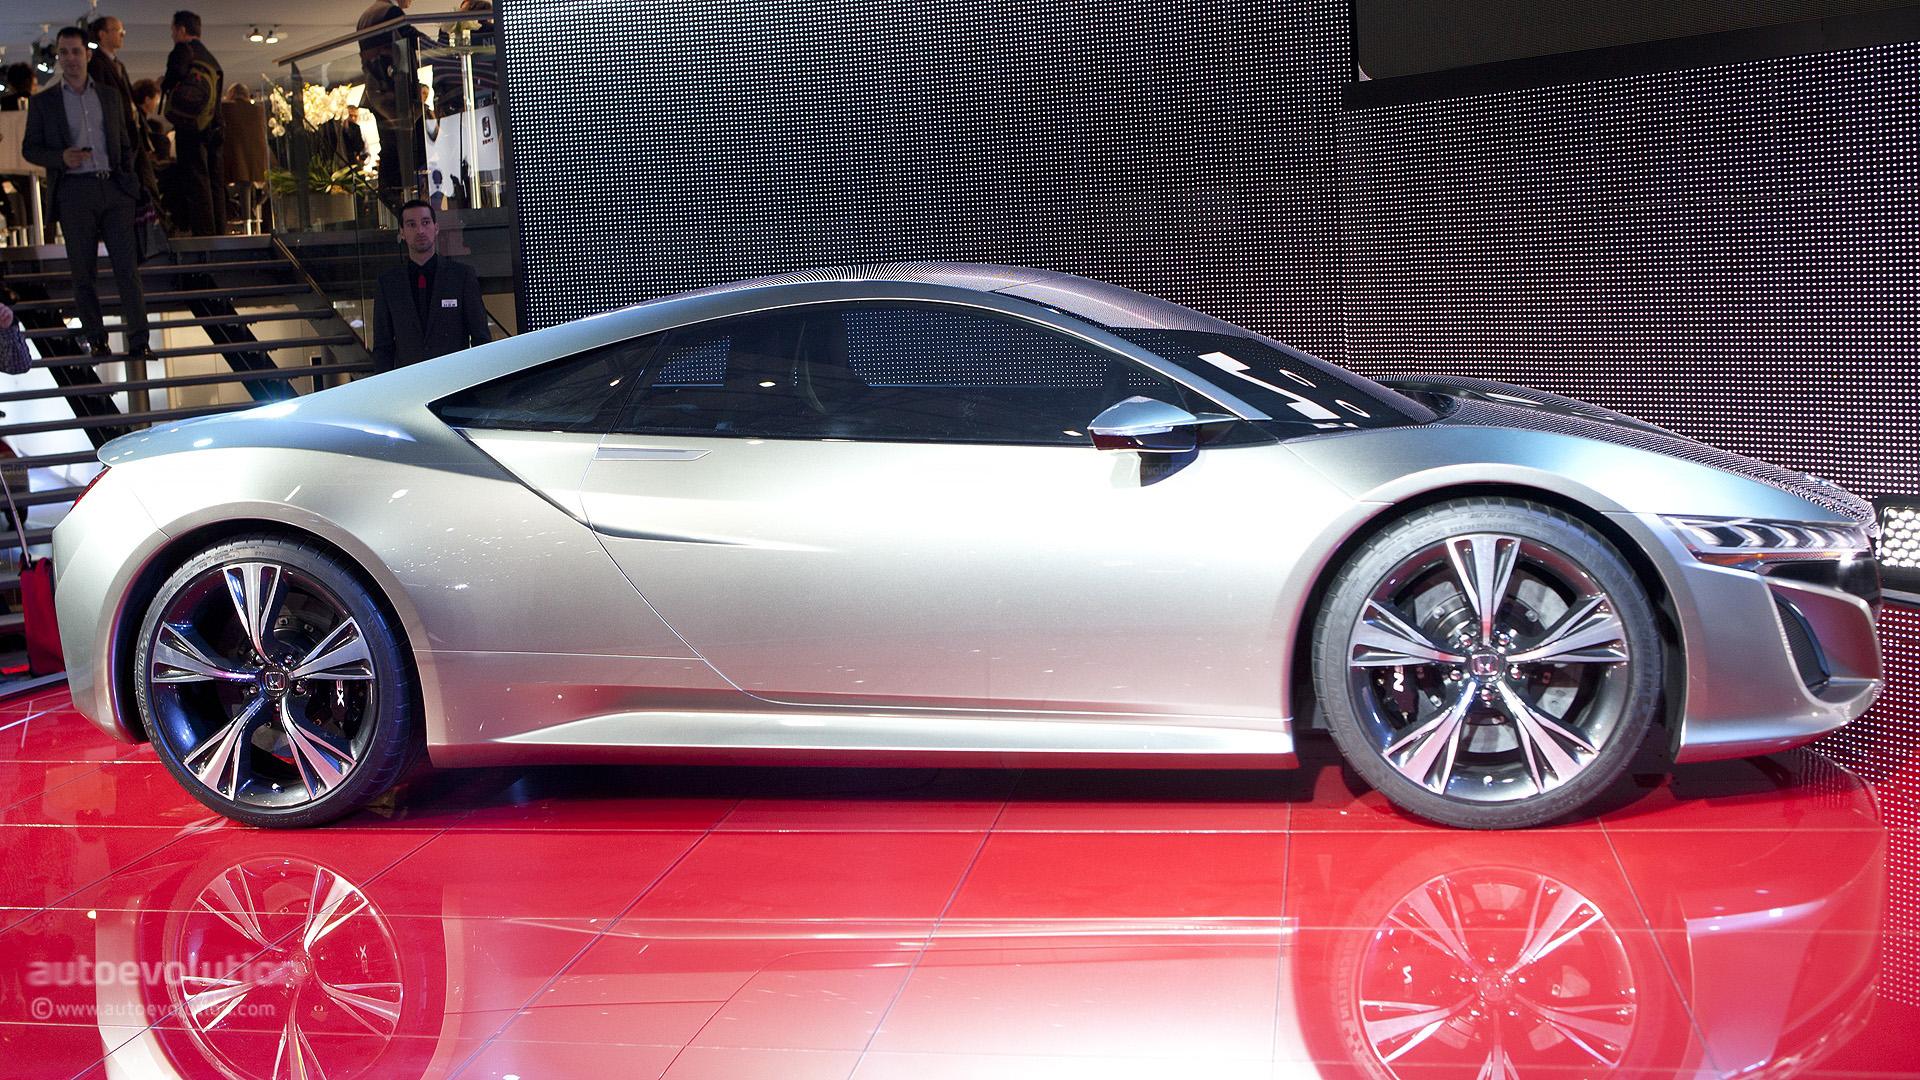 Geneva 2012: Honda NSX Concept Live Photos - autoevolution